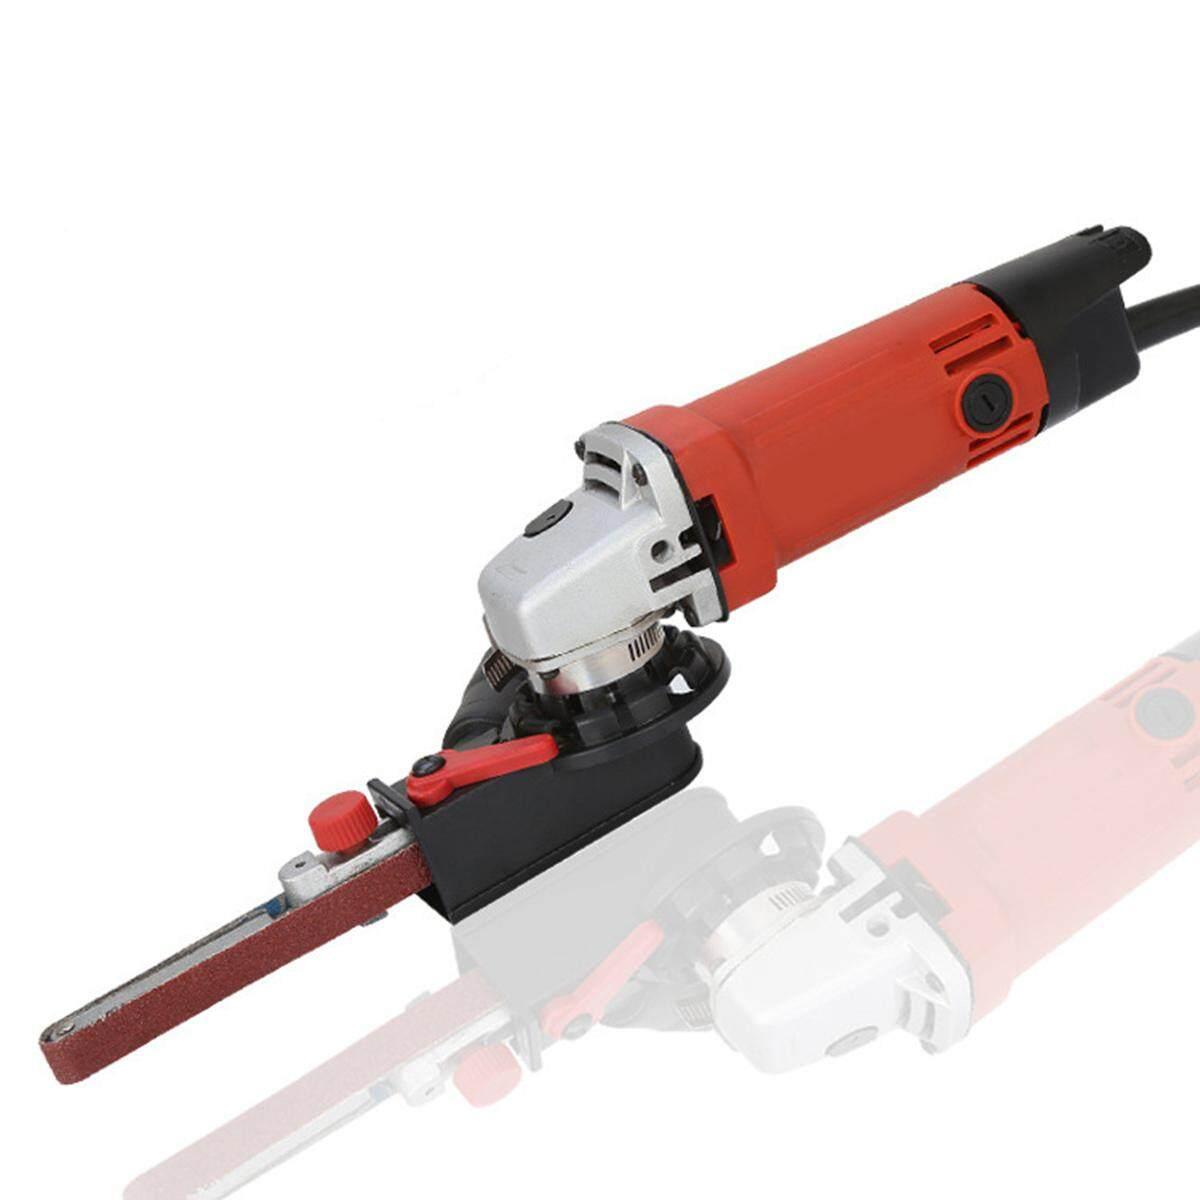 Drillpro Sanding Belt Adapter Changed 115/125 Angle Grinder into Sander Sanding Machine